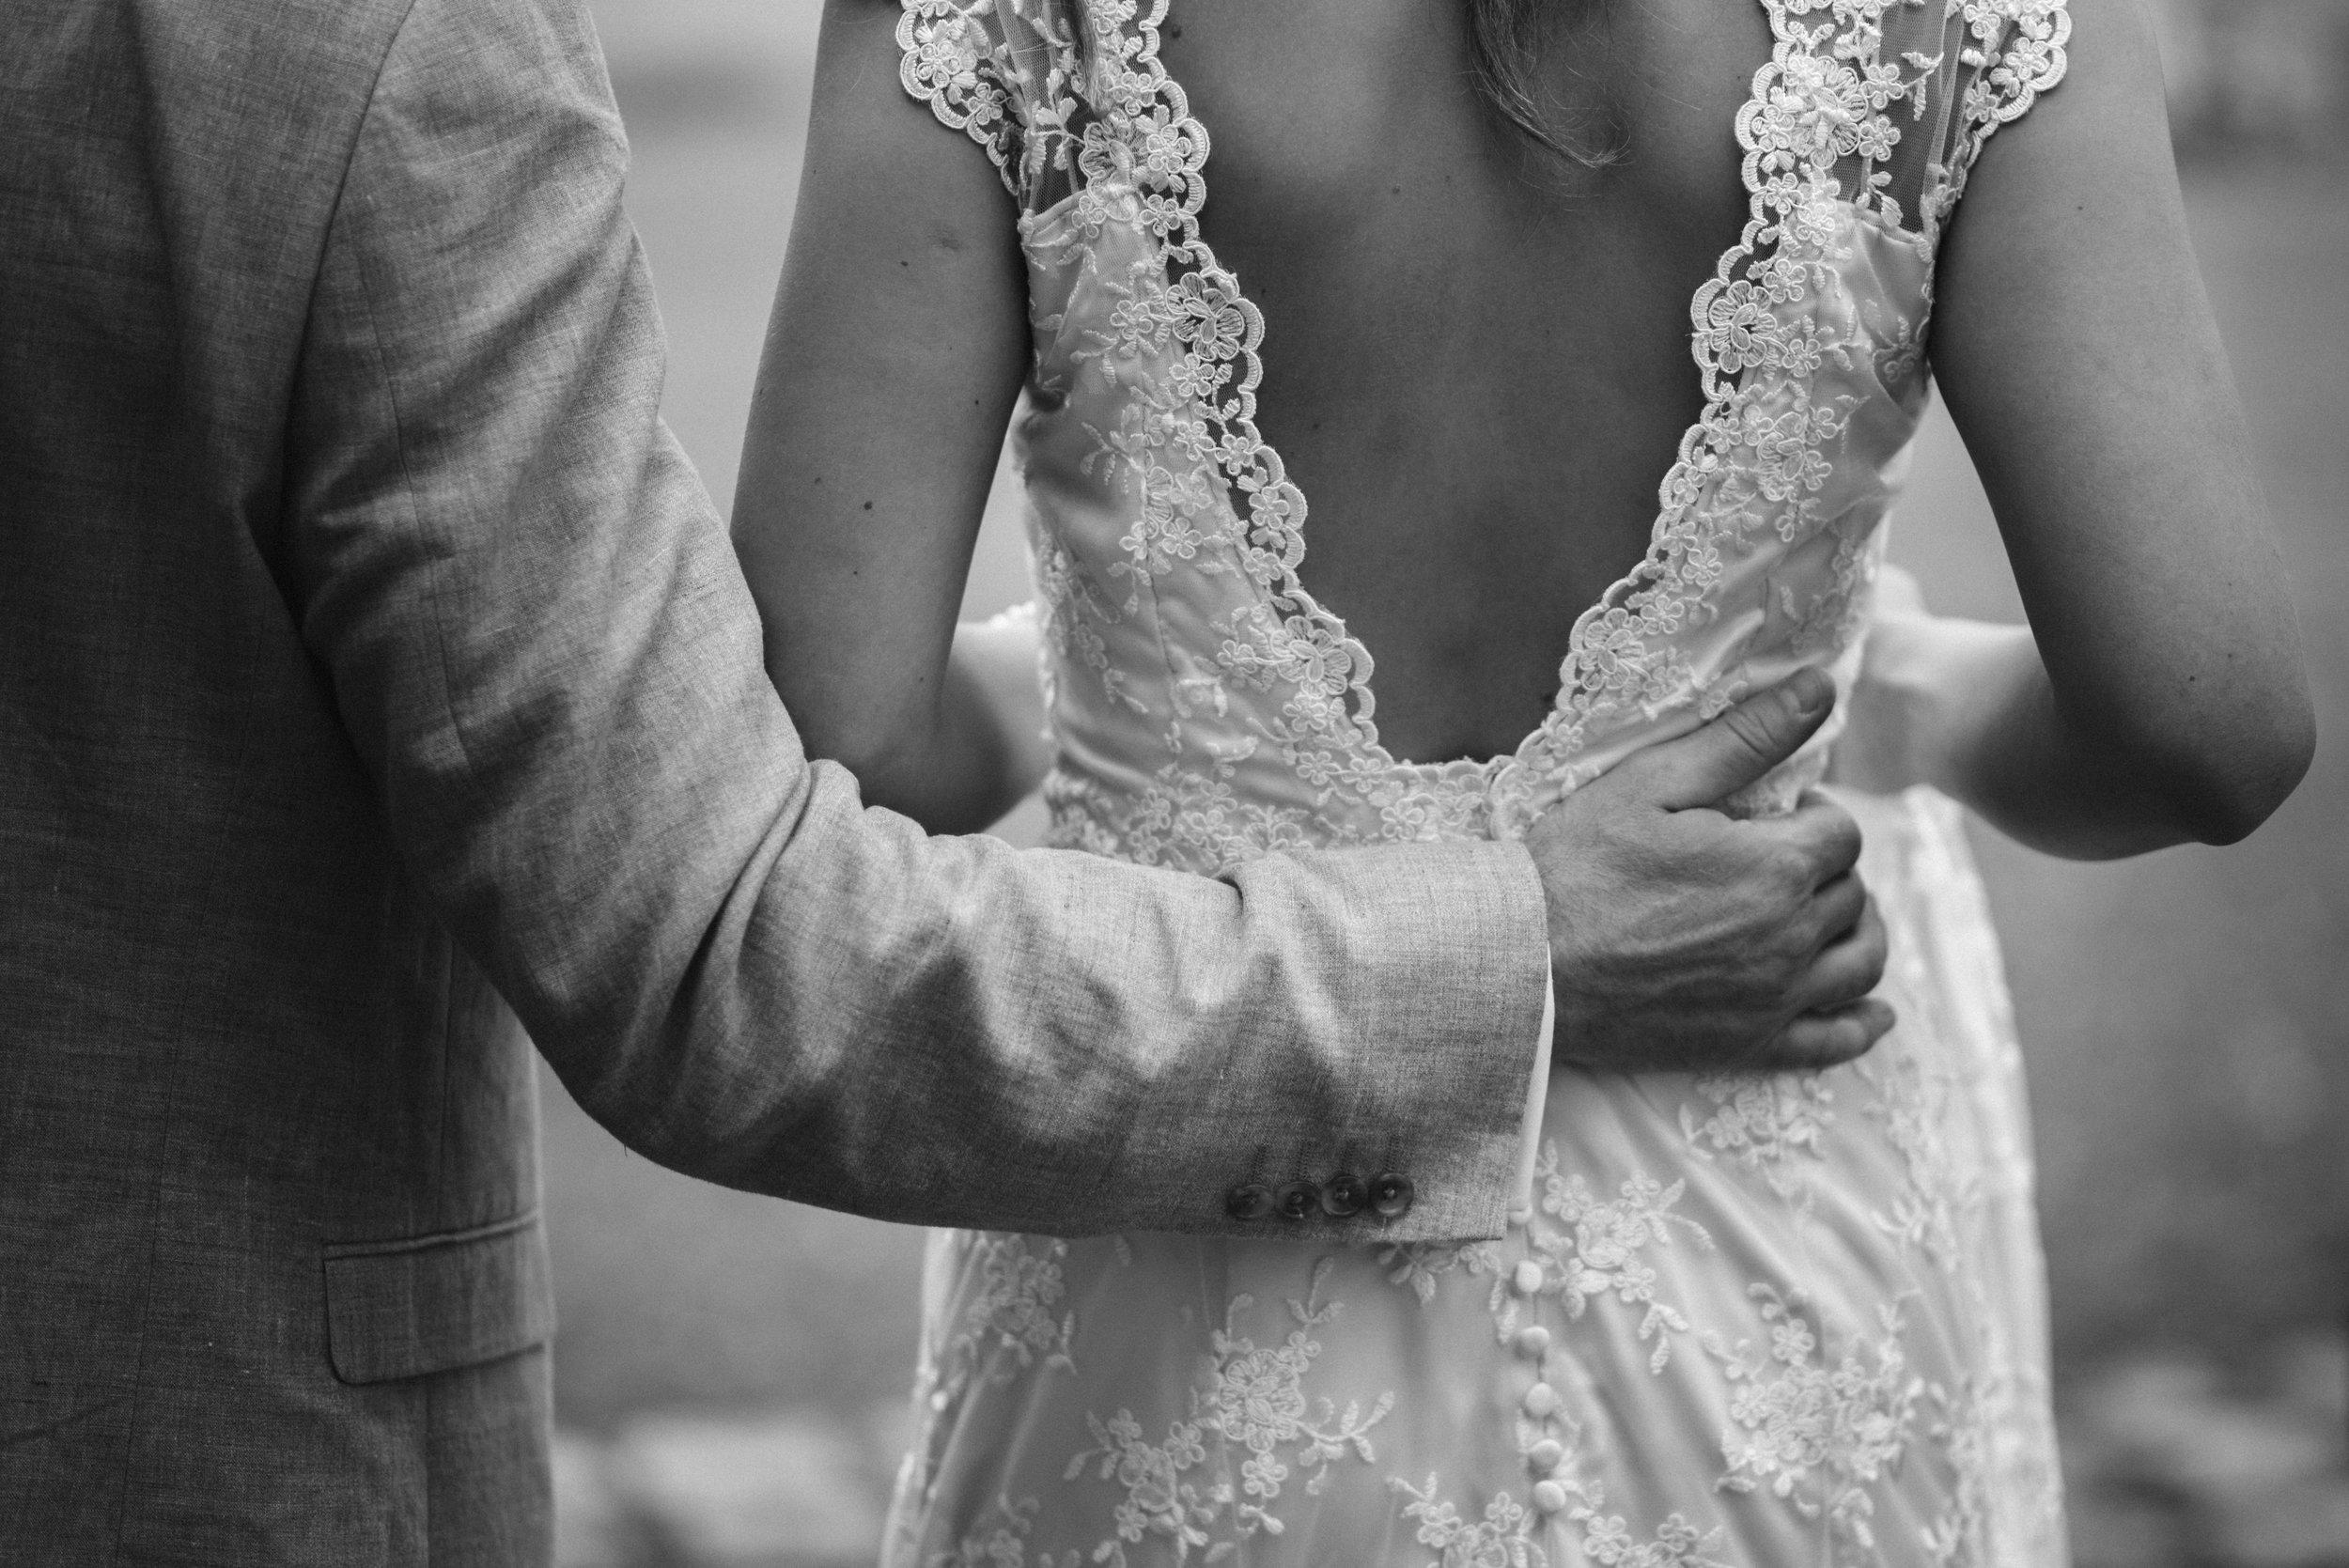 wedding-photographer-dordogne-mark-shaw-32.jpg